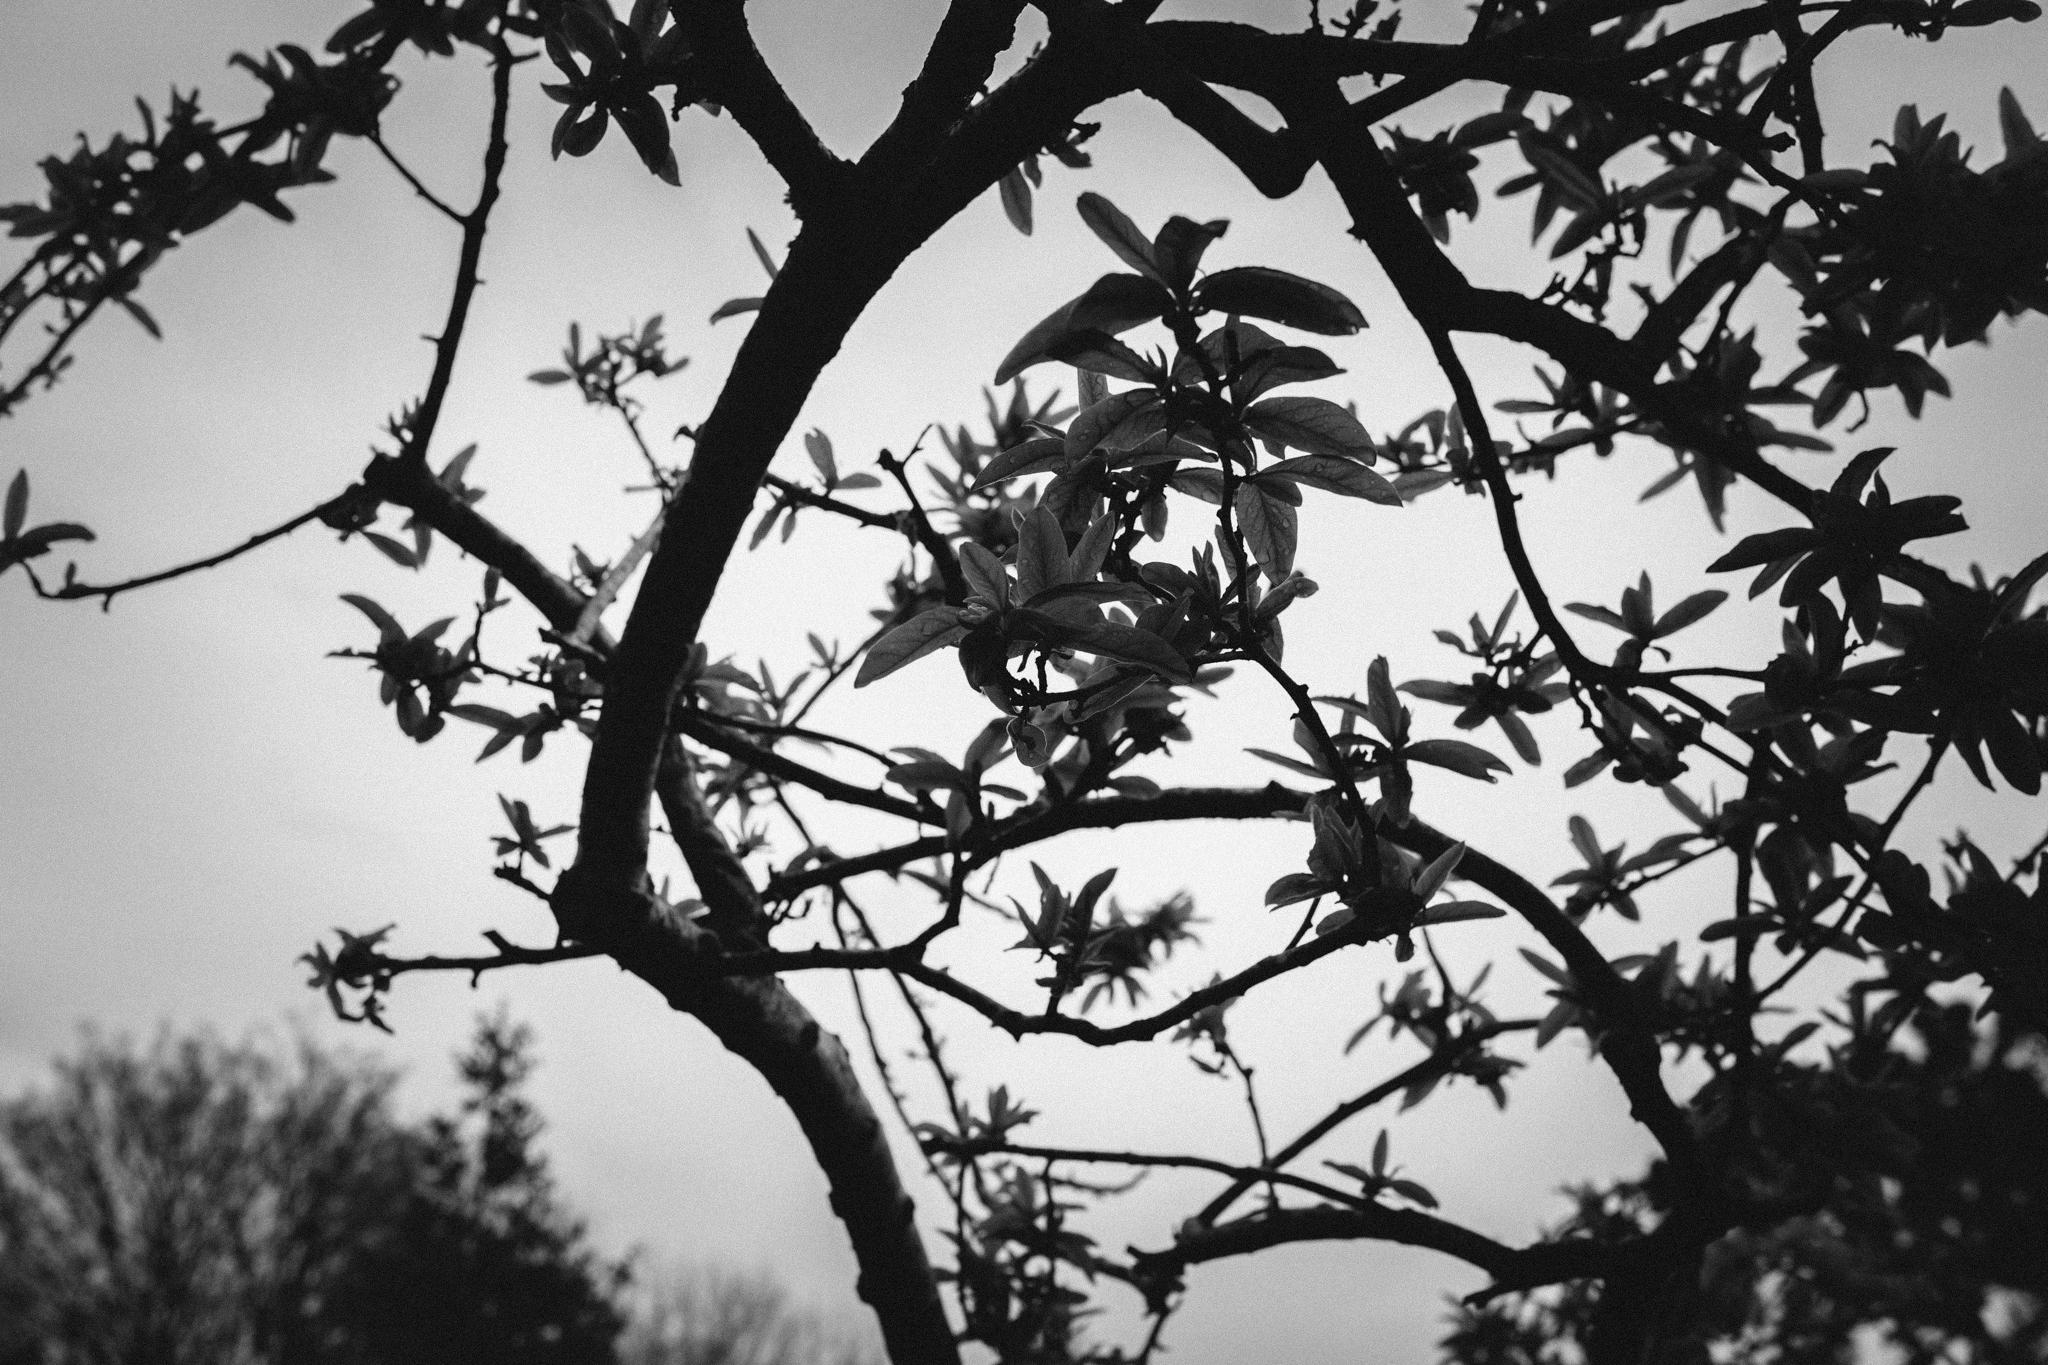 ireland_galway_dublin_rebecca_burt_photography-100.jpg